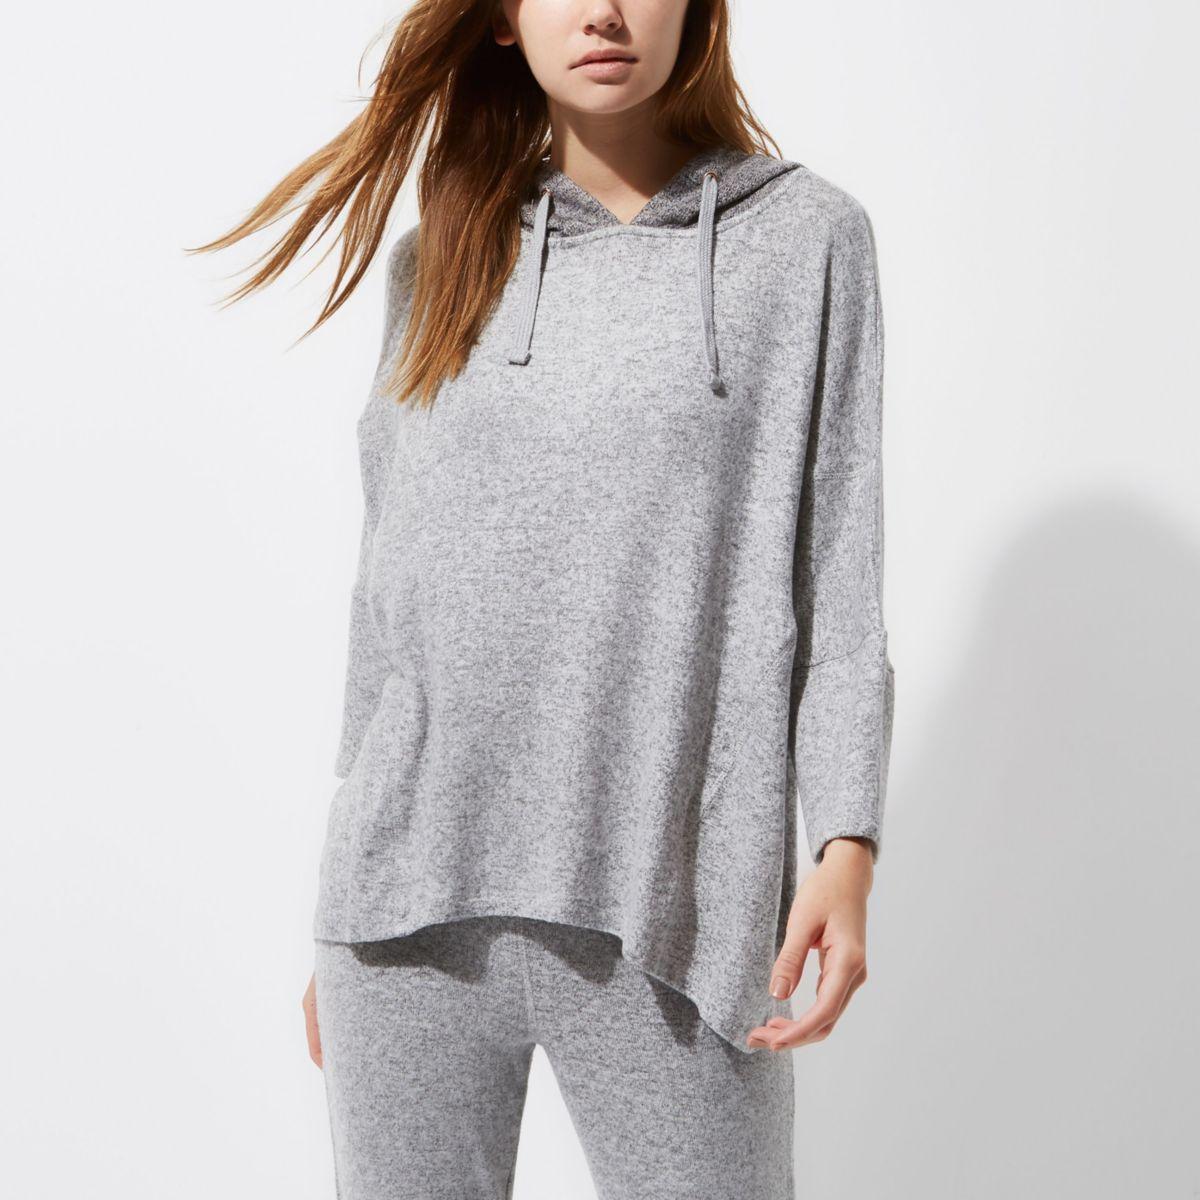 Light grey knit hooded pajama top